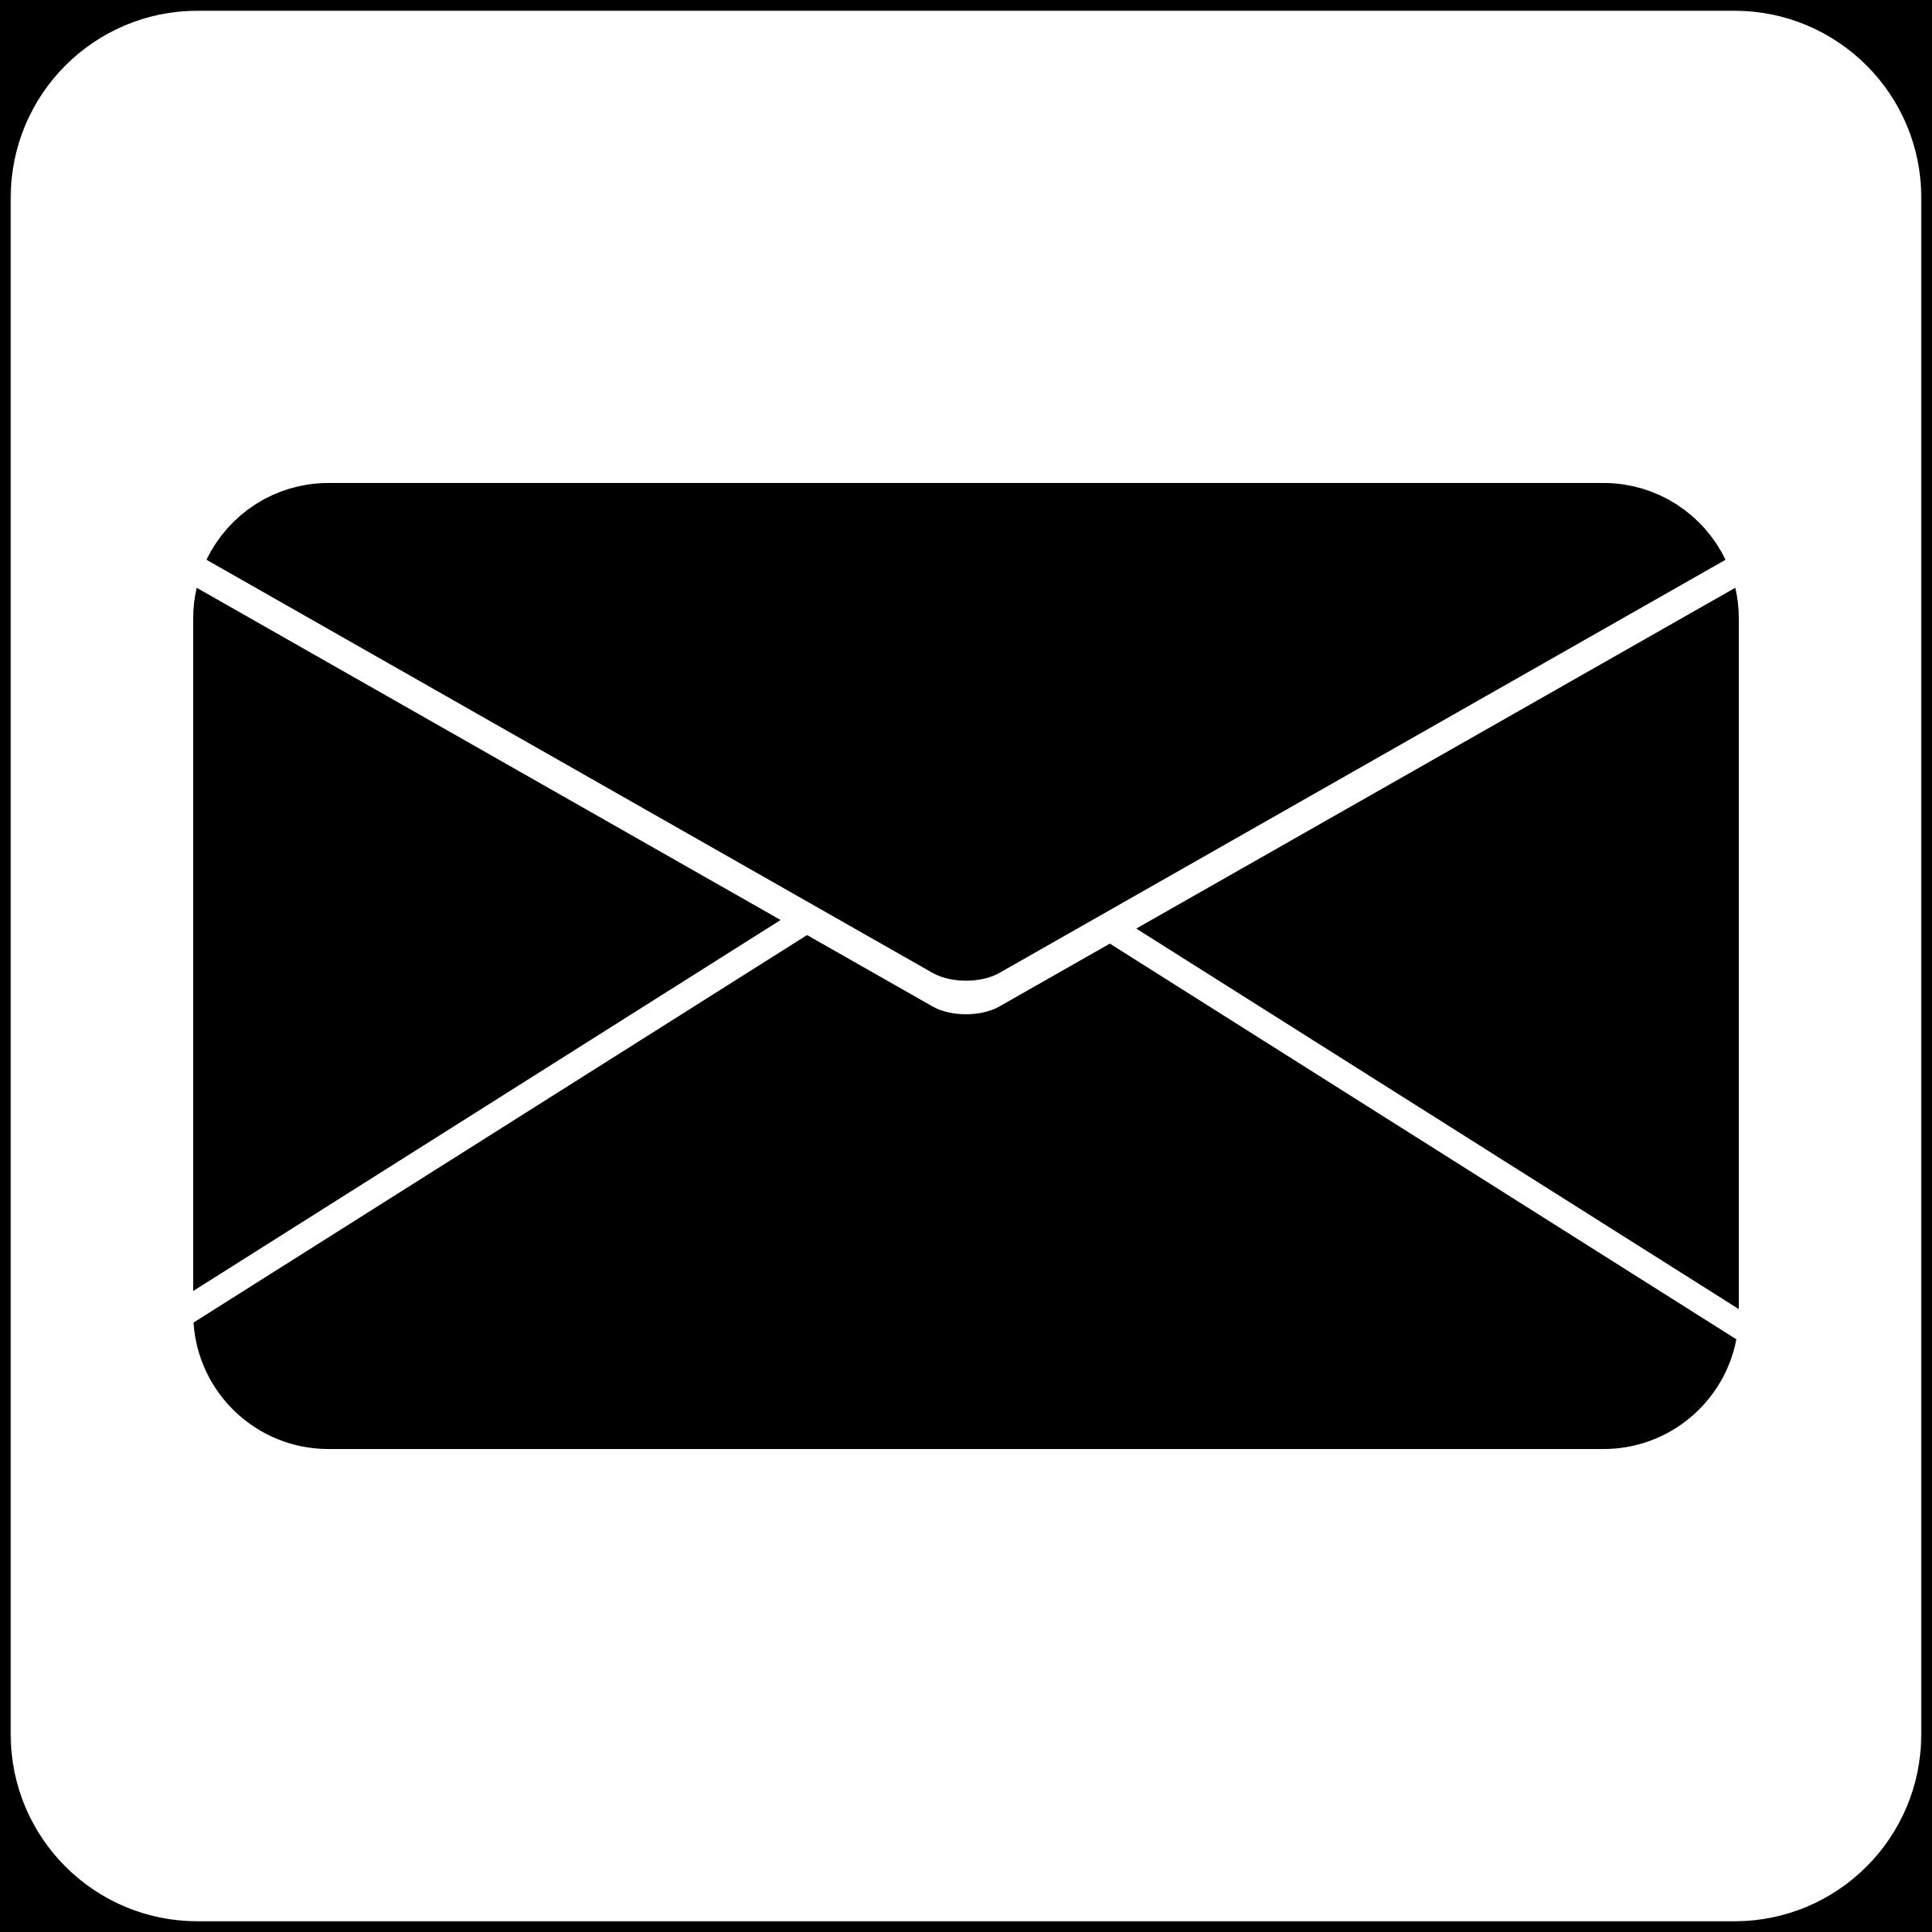 Mail symbol clipart